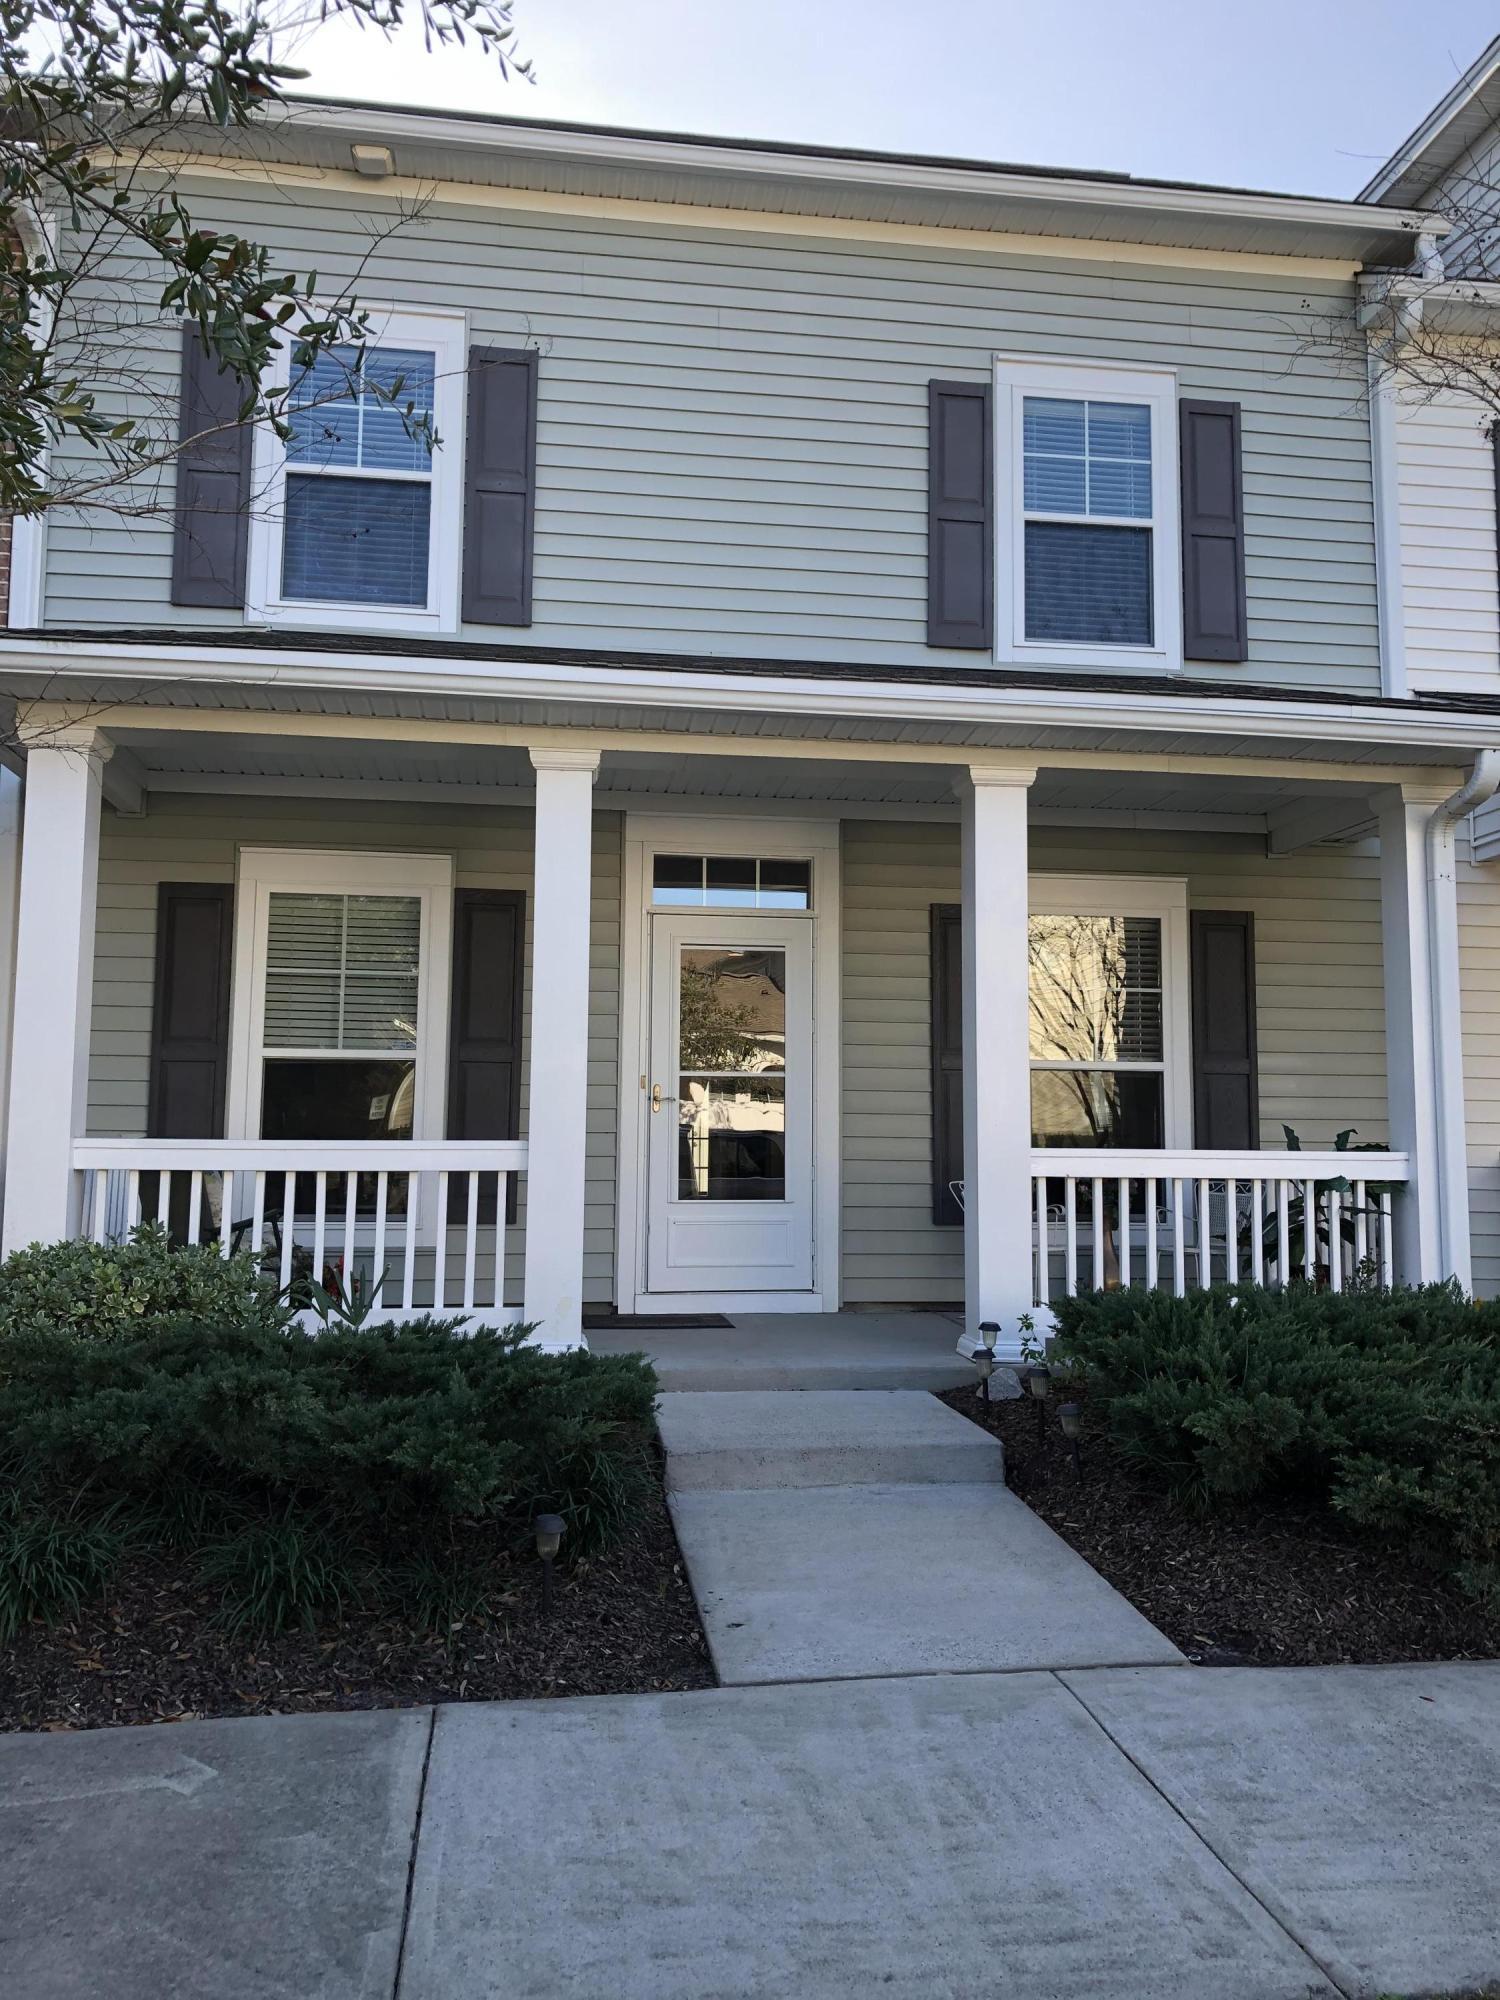 Boltons Landing Homes For Sale - 1445 Nautical Chart, Charleston, SC - 0